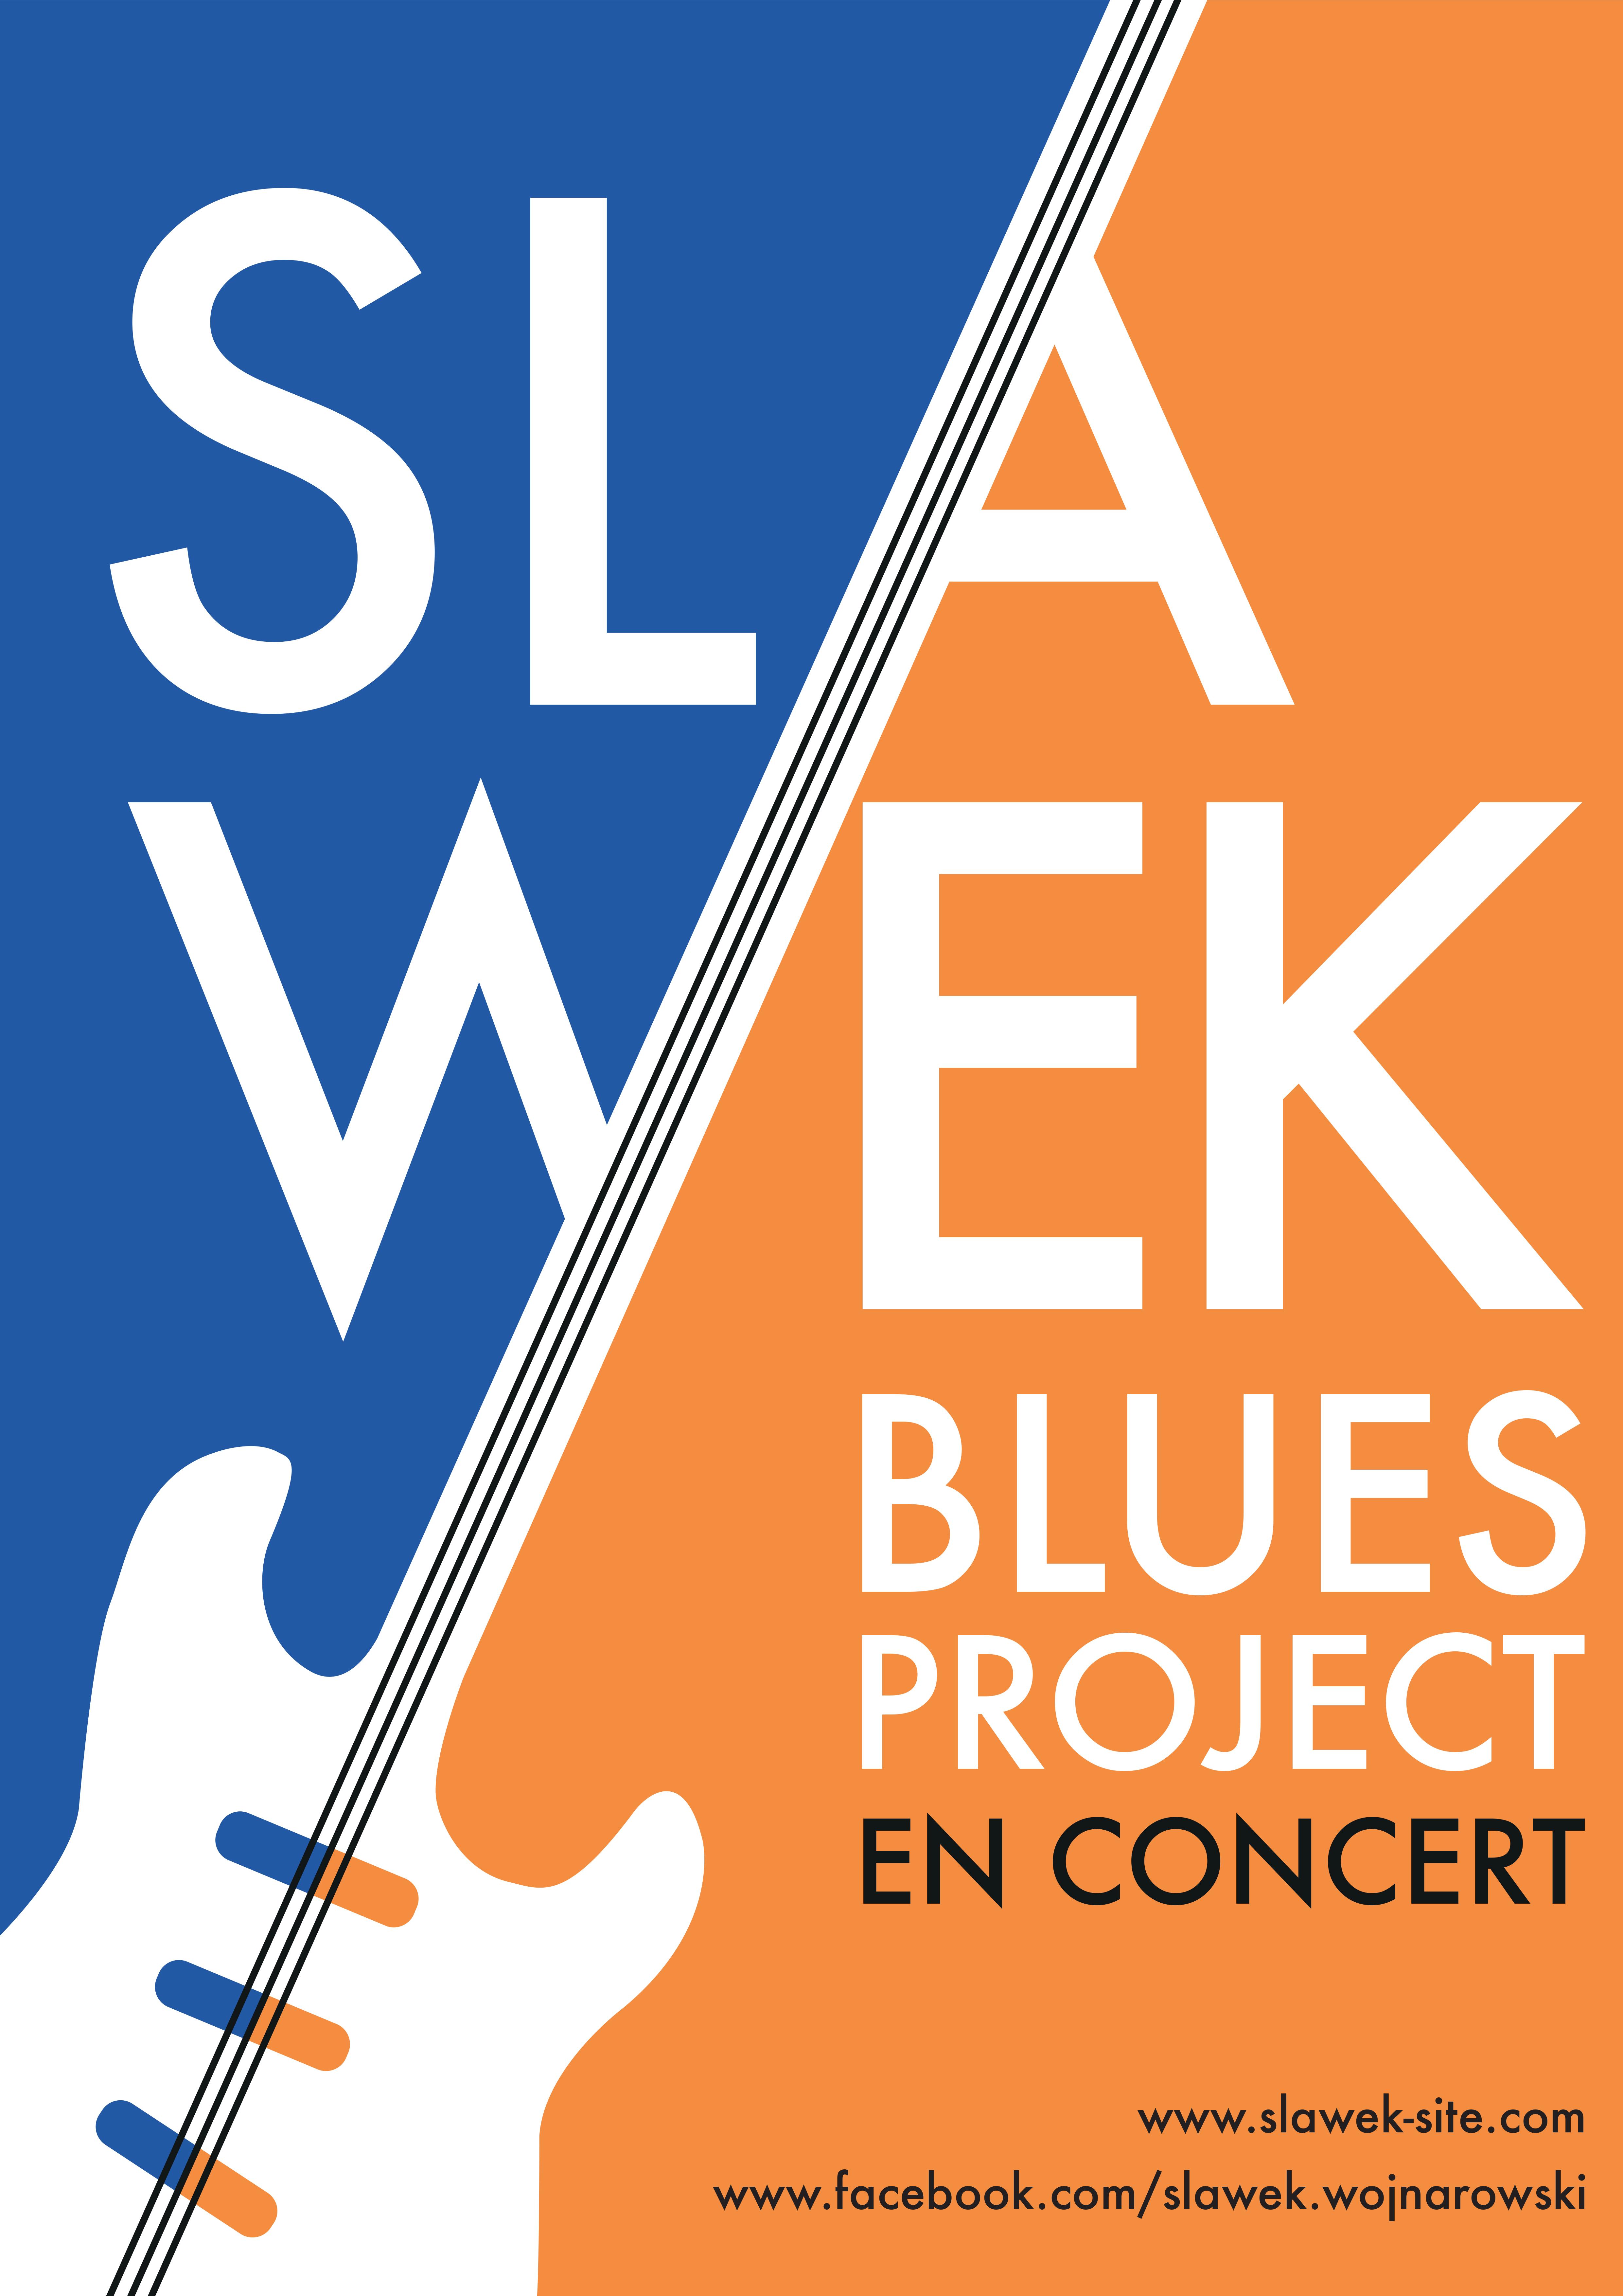 Affiche Slawek blues project